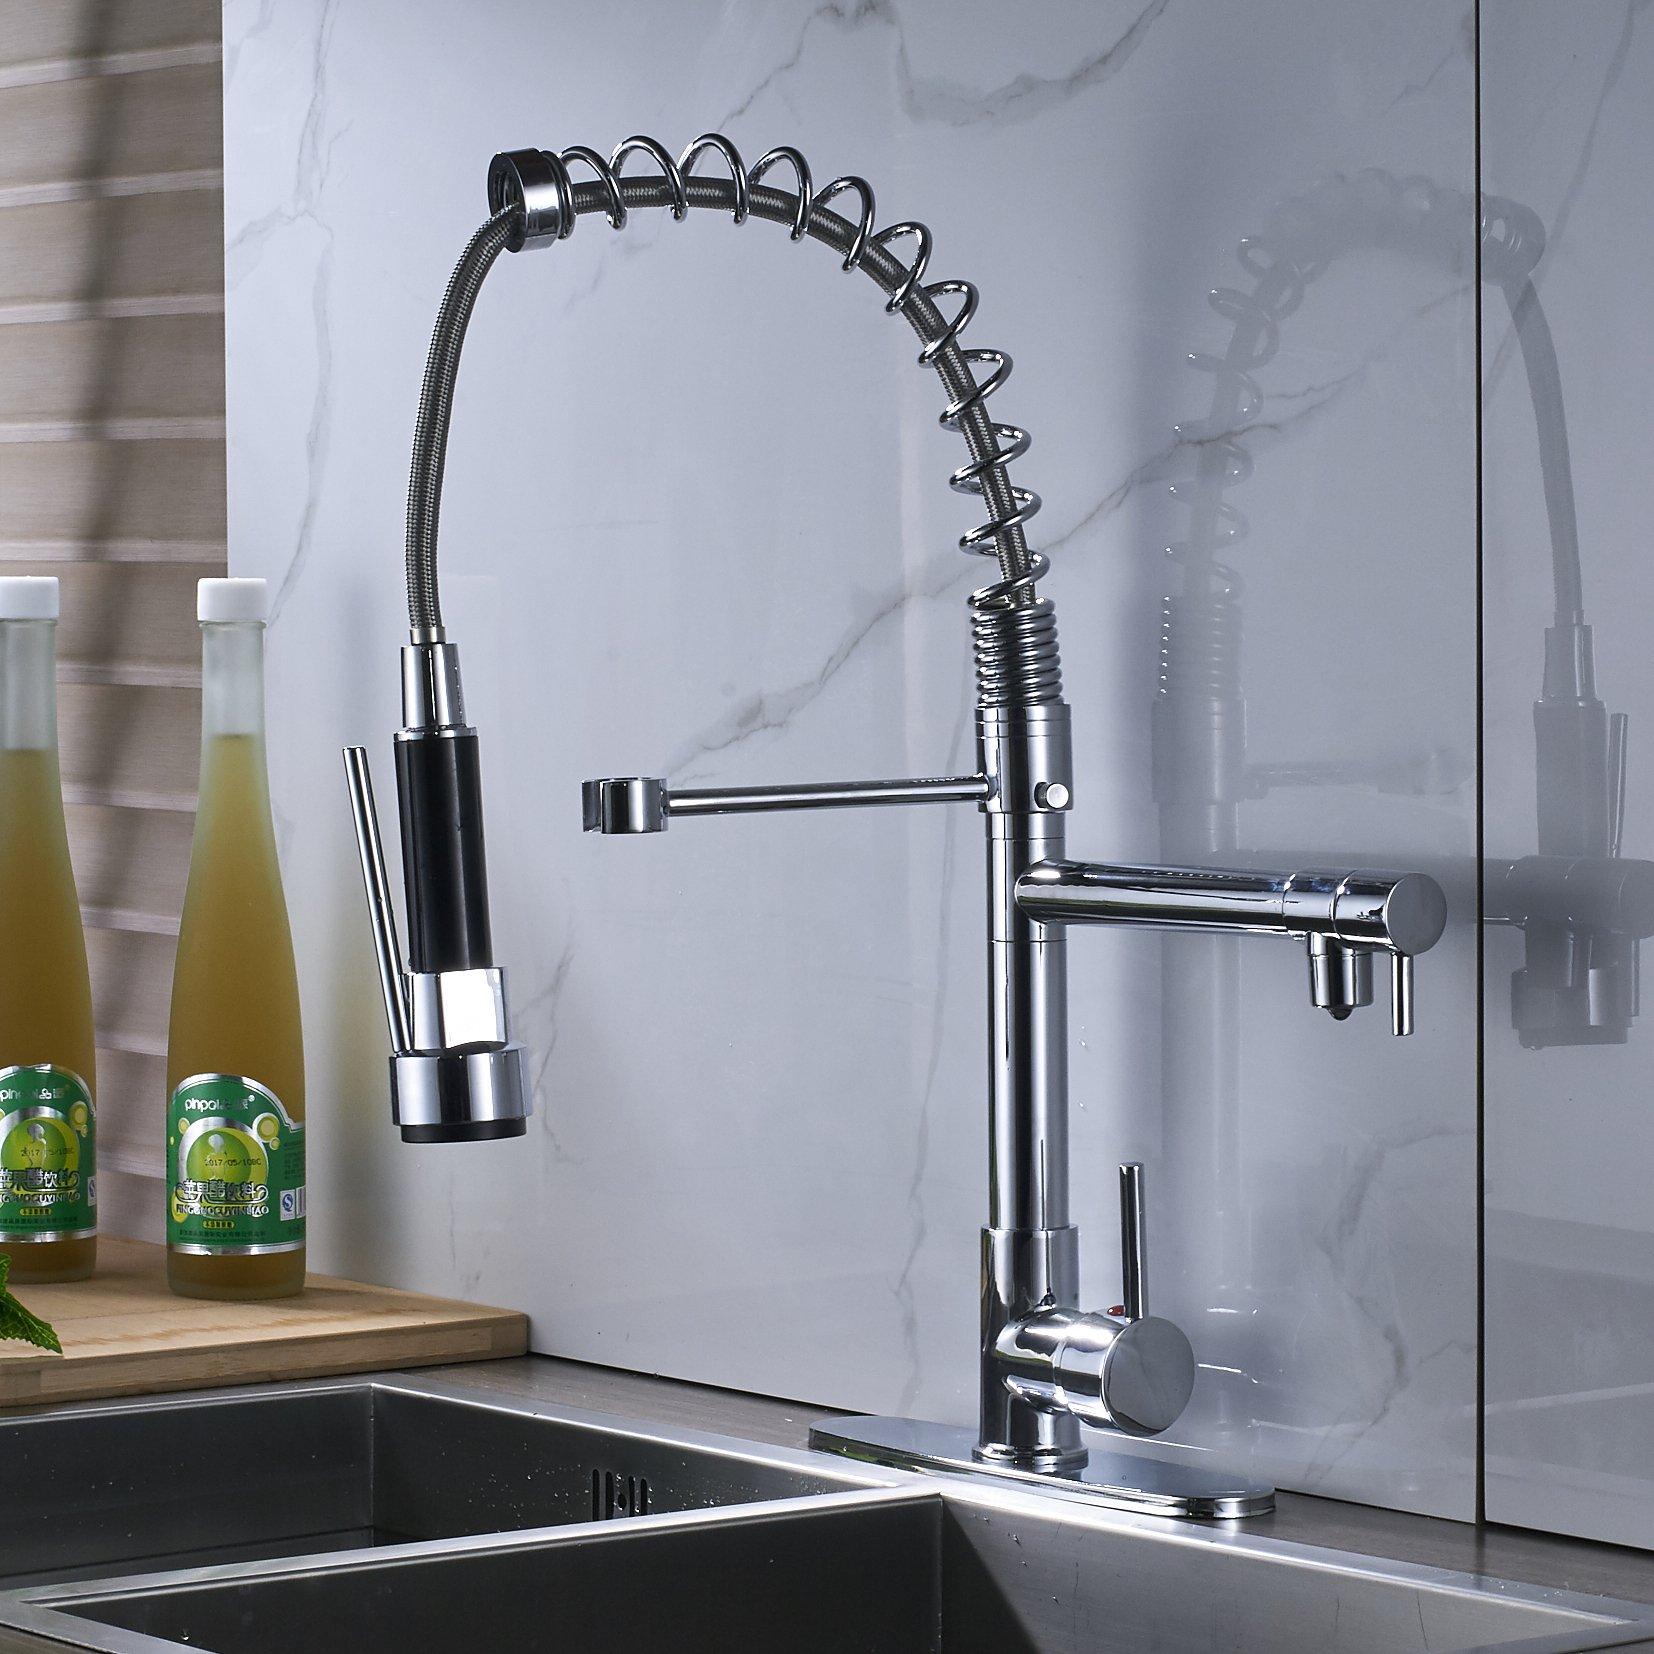 Rozin Chrome Finish LED Light Sprayer Kitchen Sink Faucet Spring Swivel Spout Mixer Tap by Rozin (Image #8)